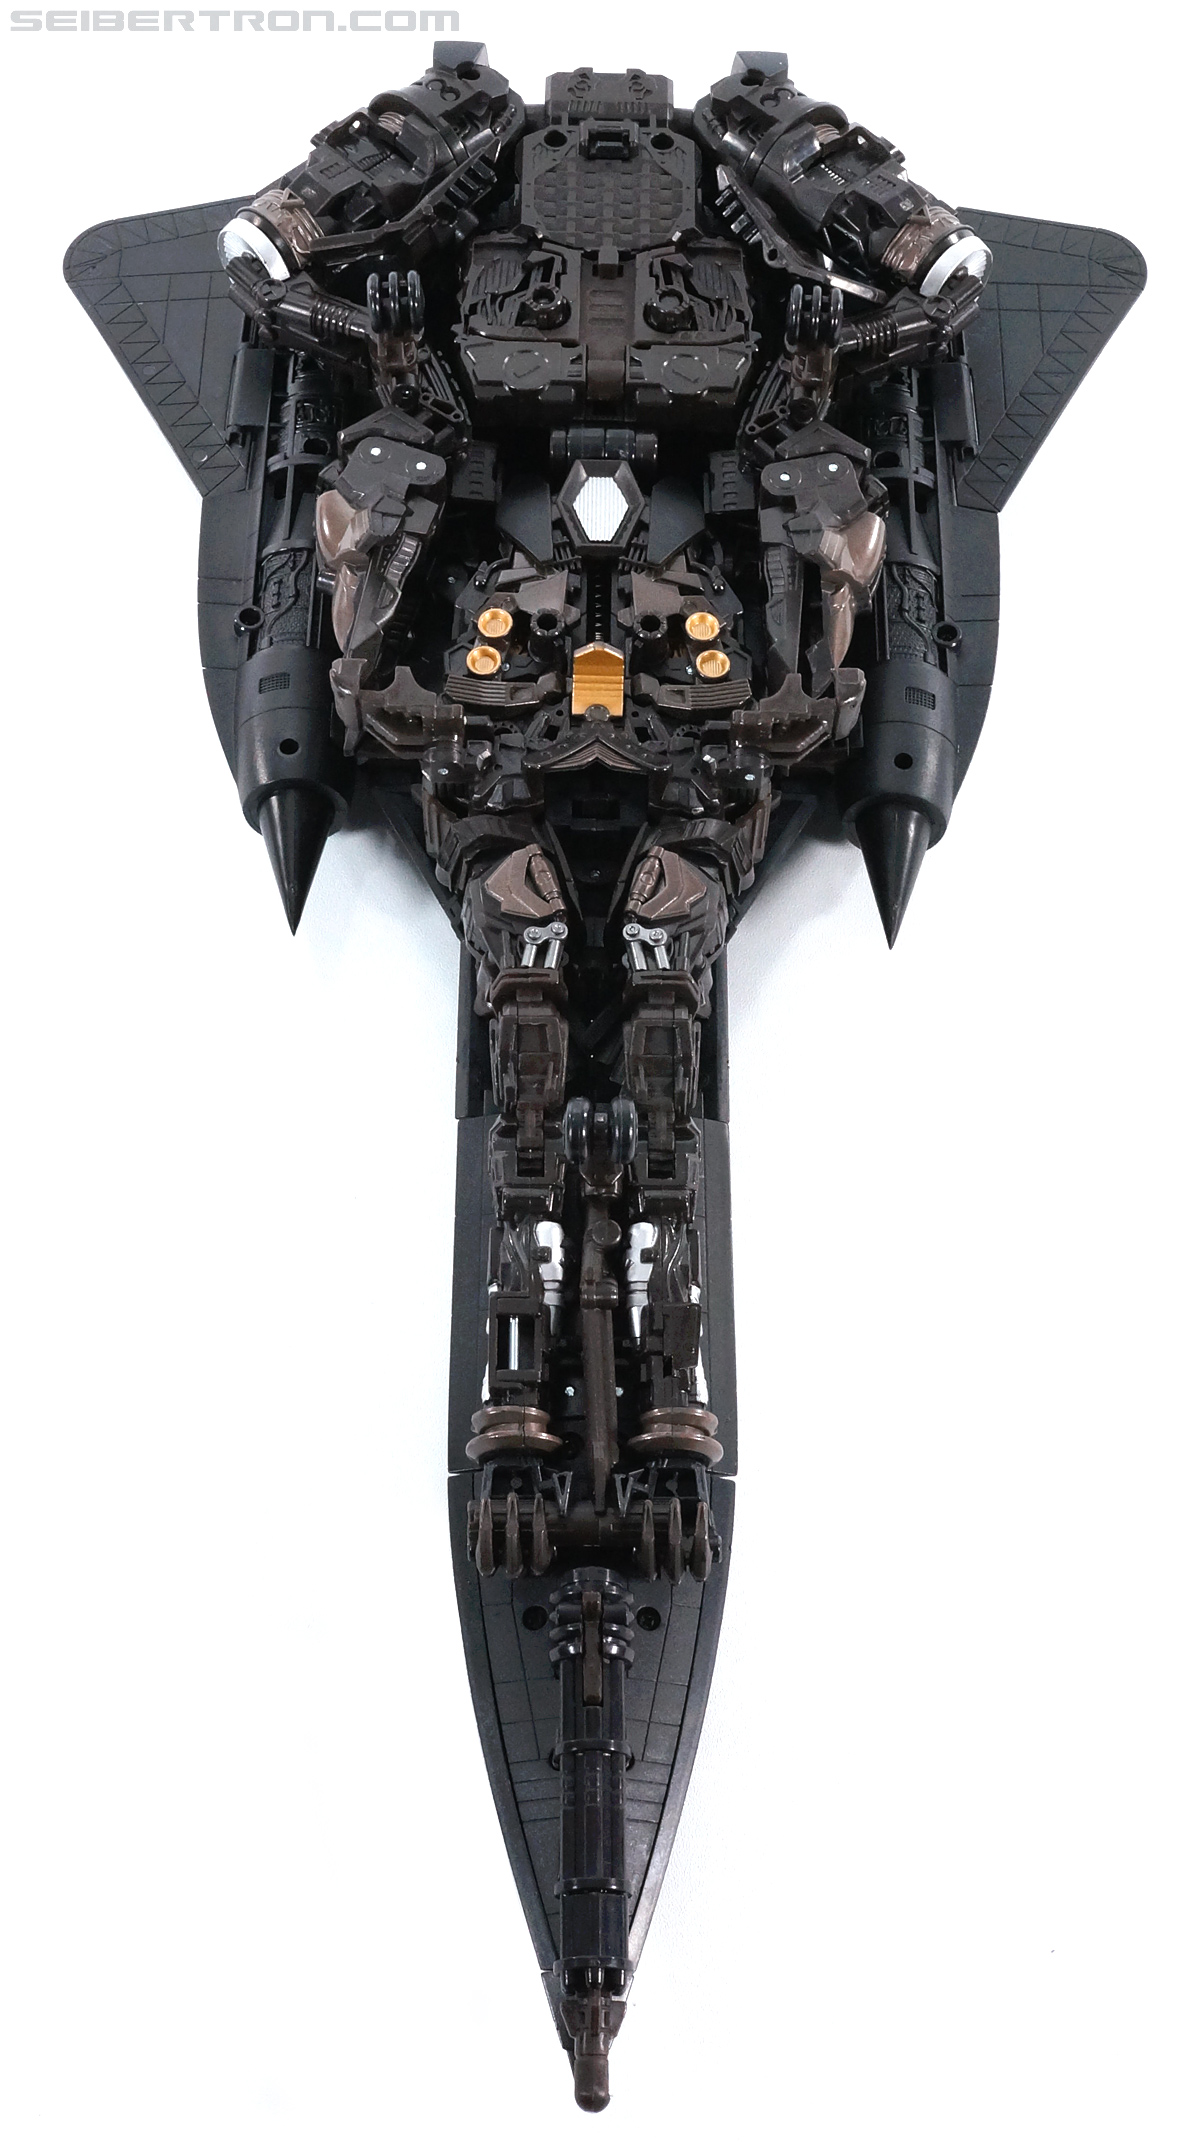 Transformers Revenge of the Fallen Jetfire (Jetpower 2-pack) (Reissue) (Image #20 of 115)